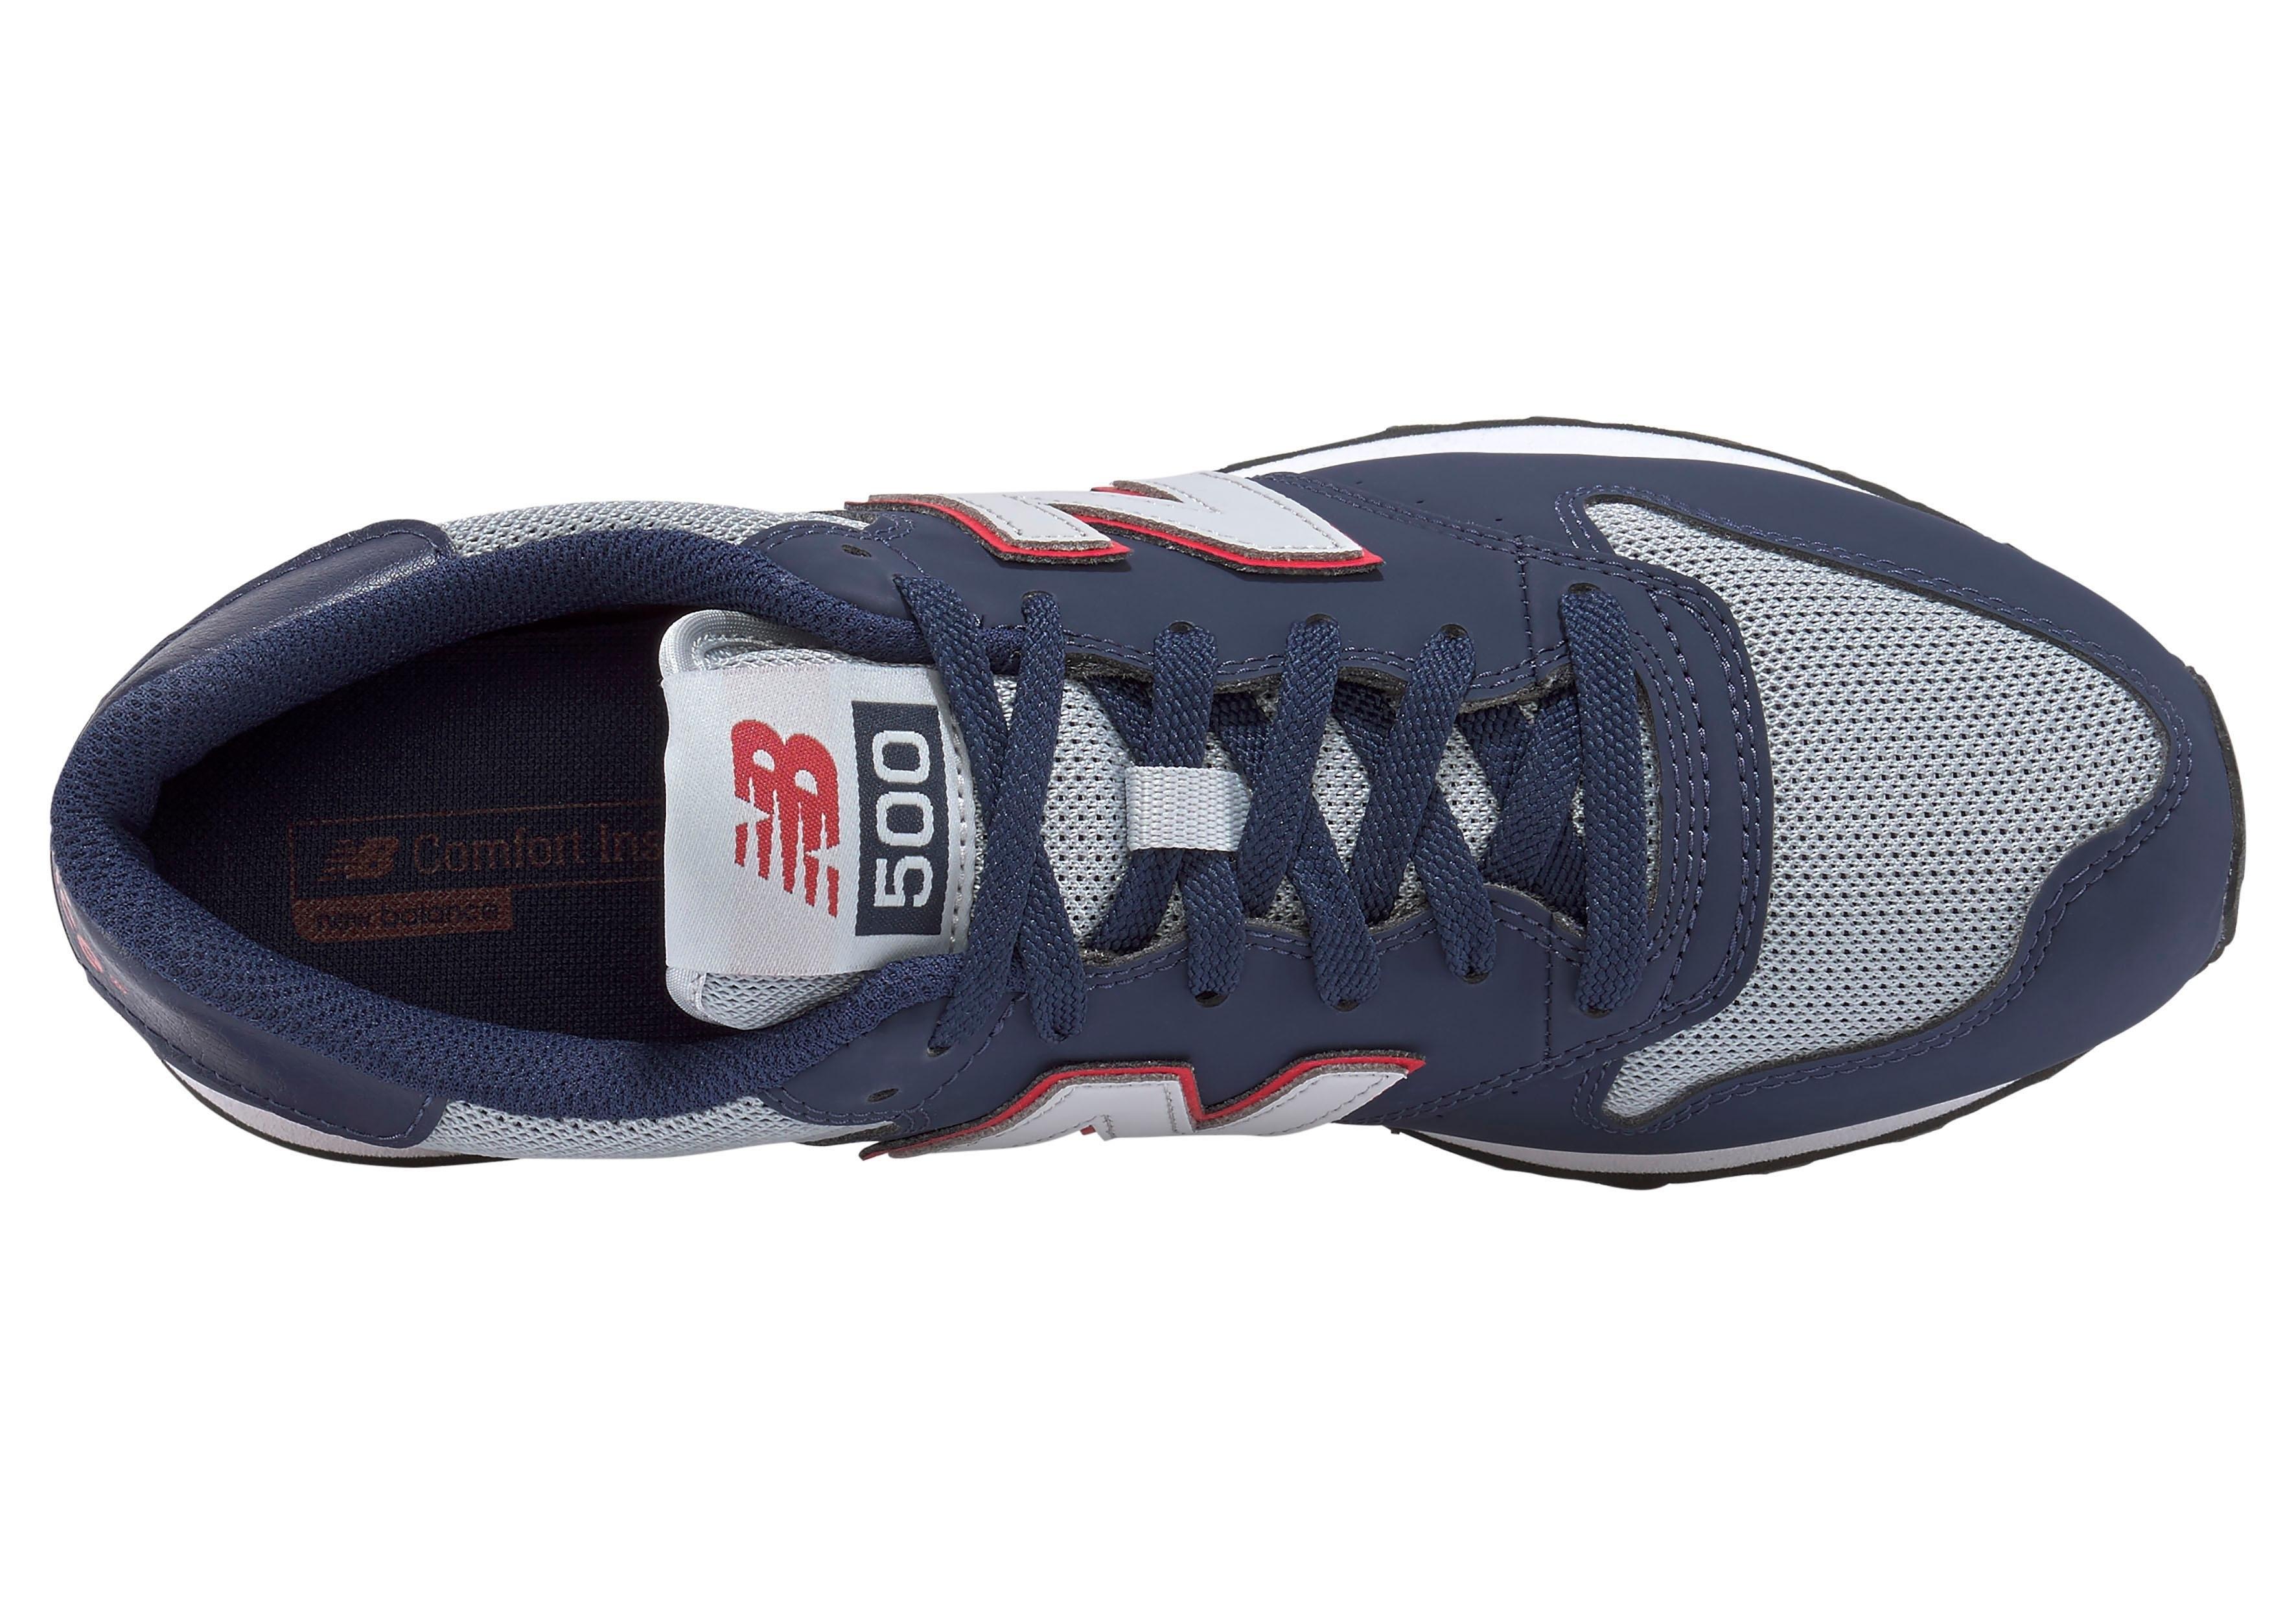 Sneakersgm Nu Bij 500Bestel New Balance 5LAR34j